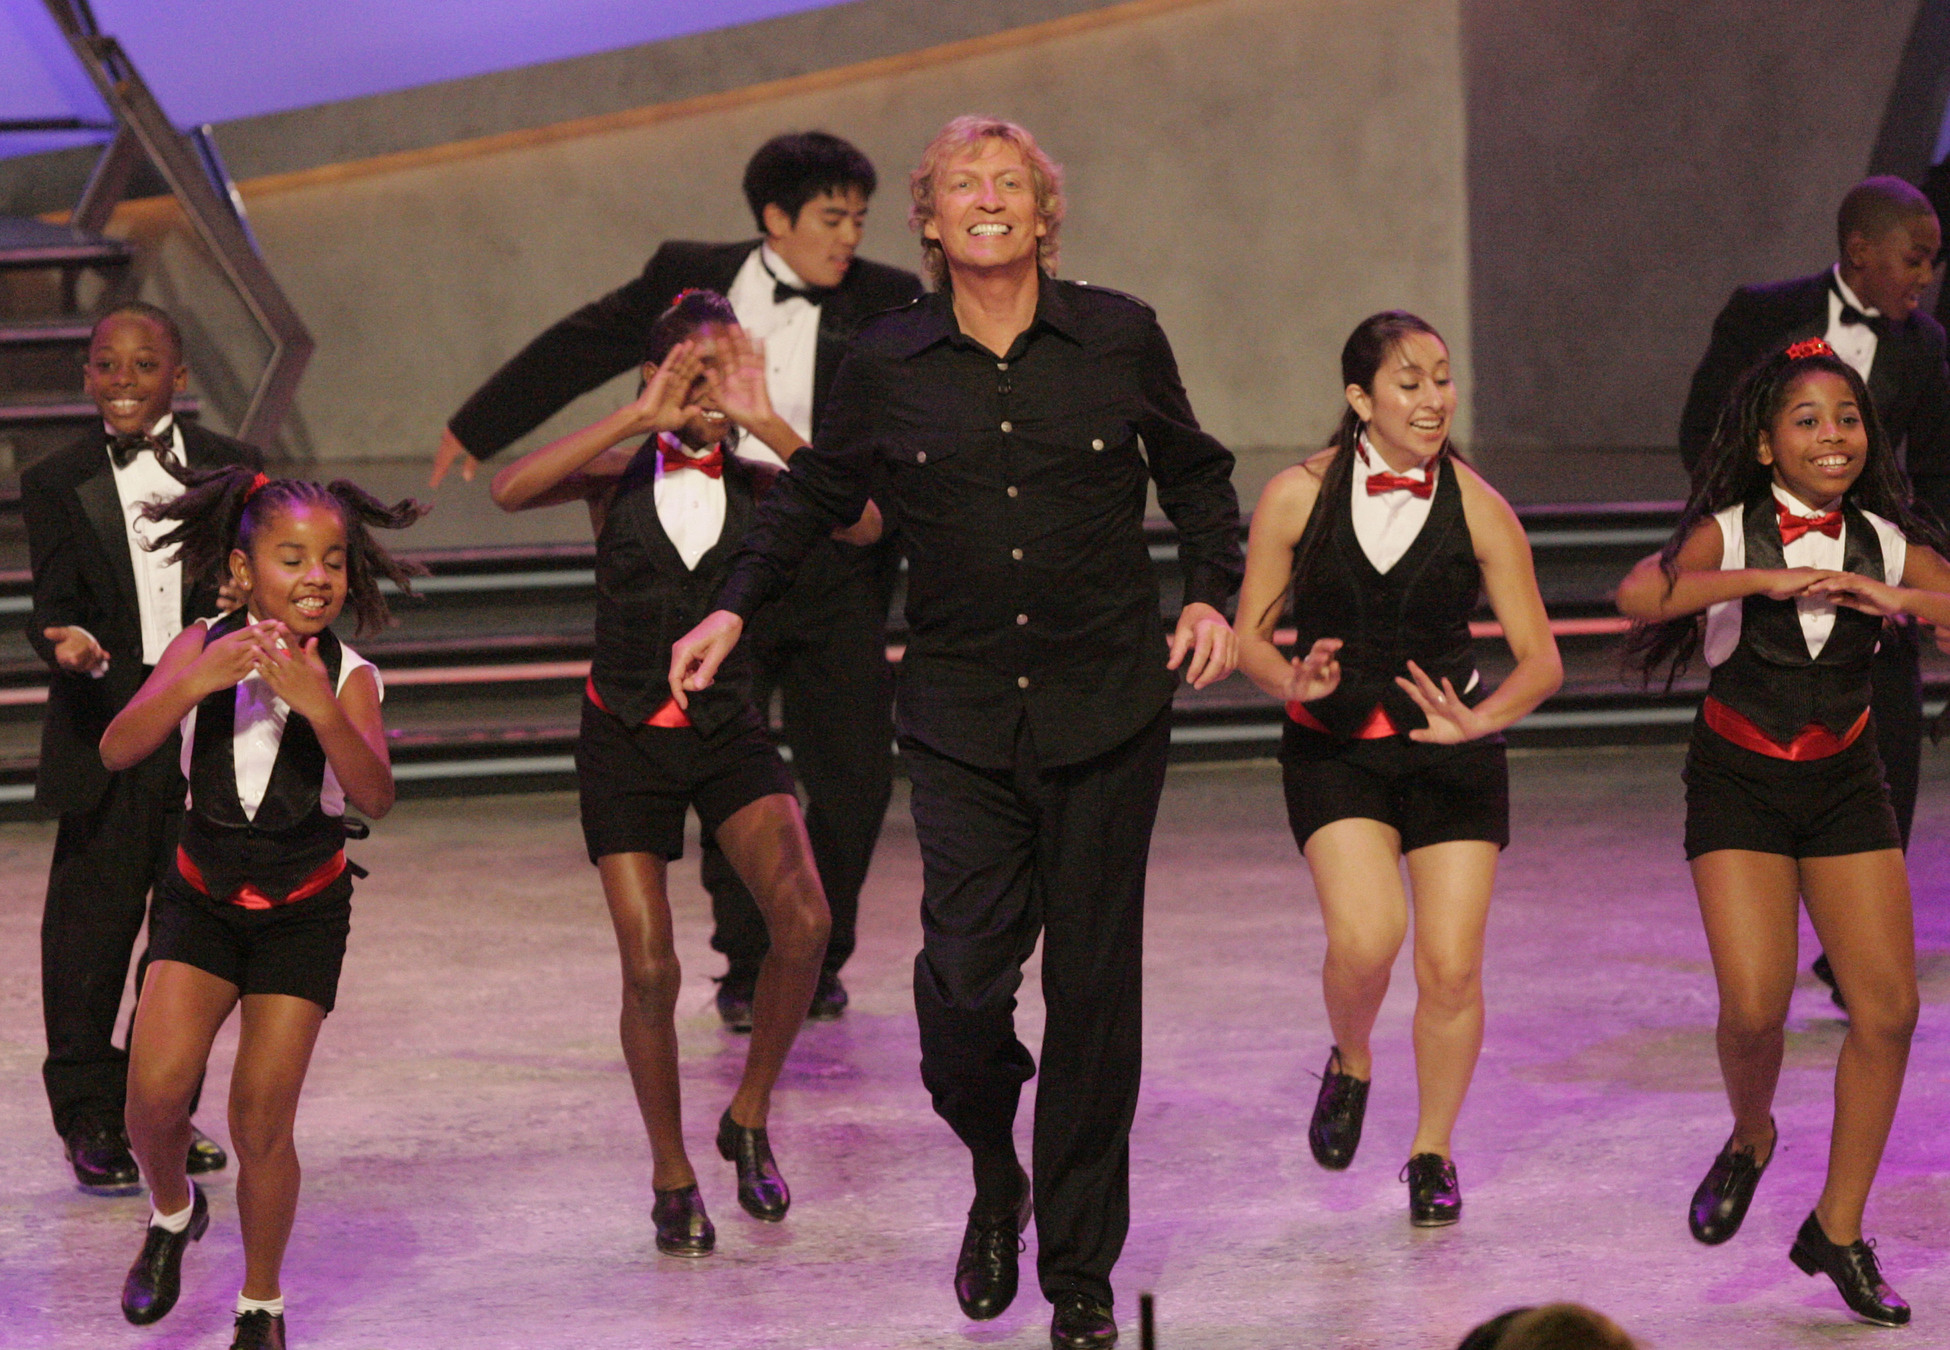 Nigel Lythgoes Mission to Get America Dancing